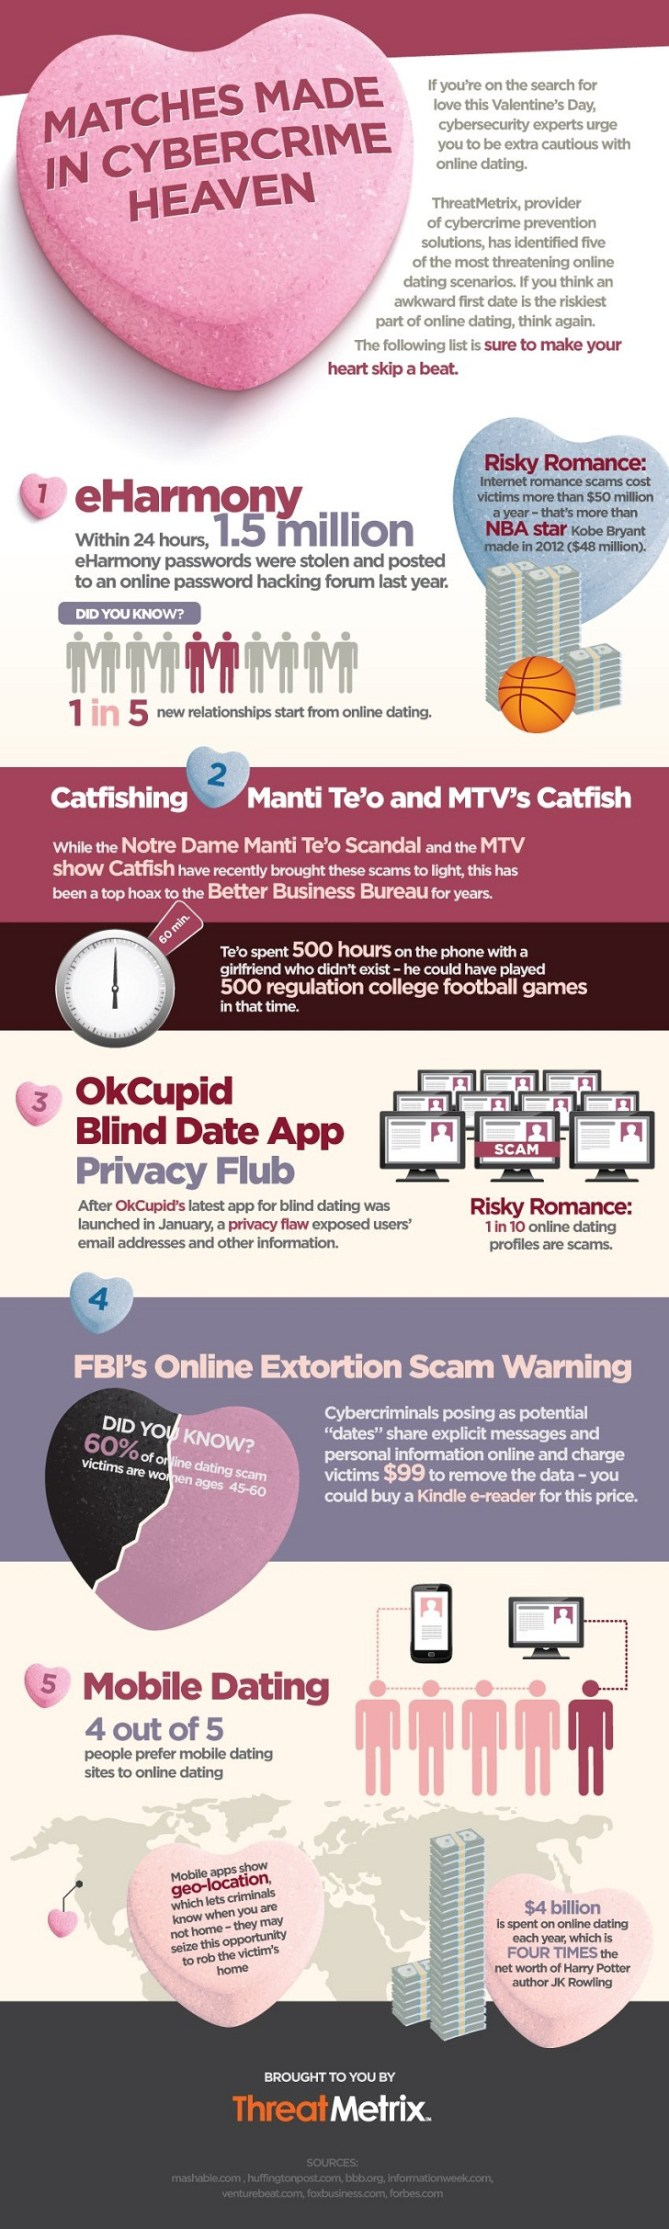 Online hookup scams